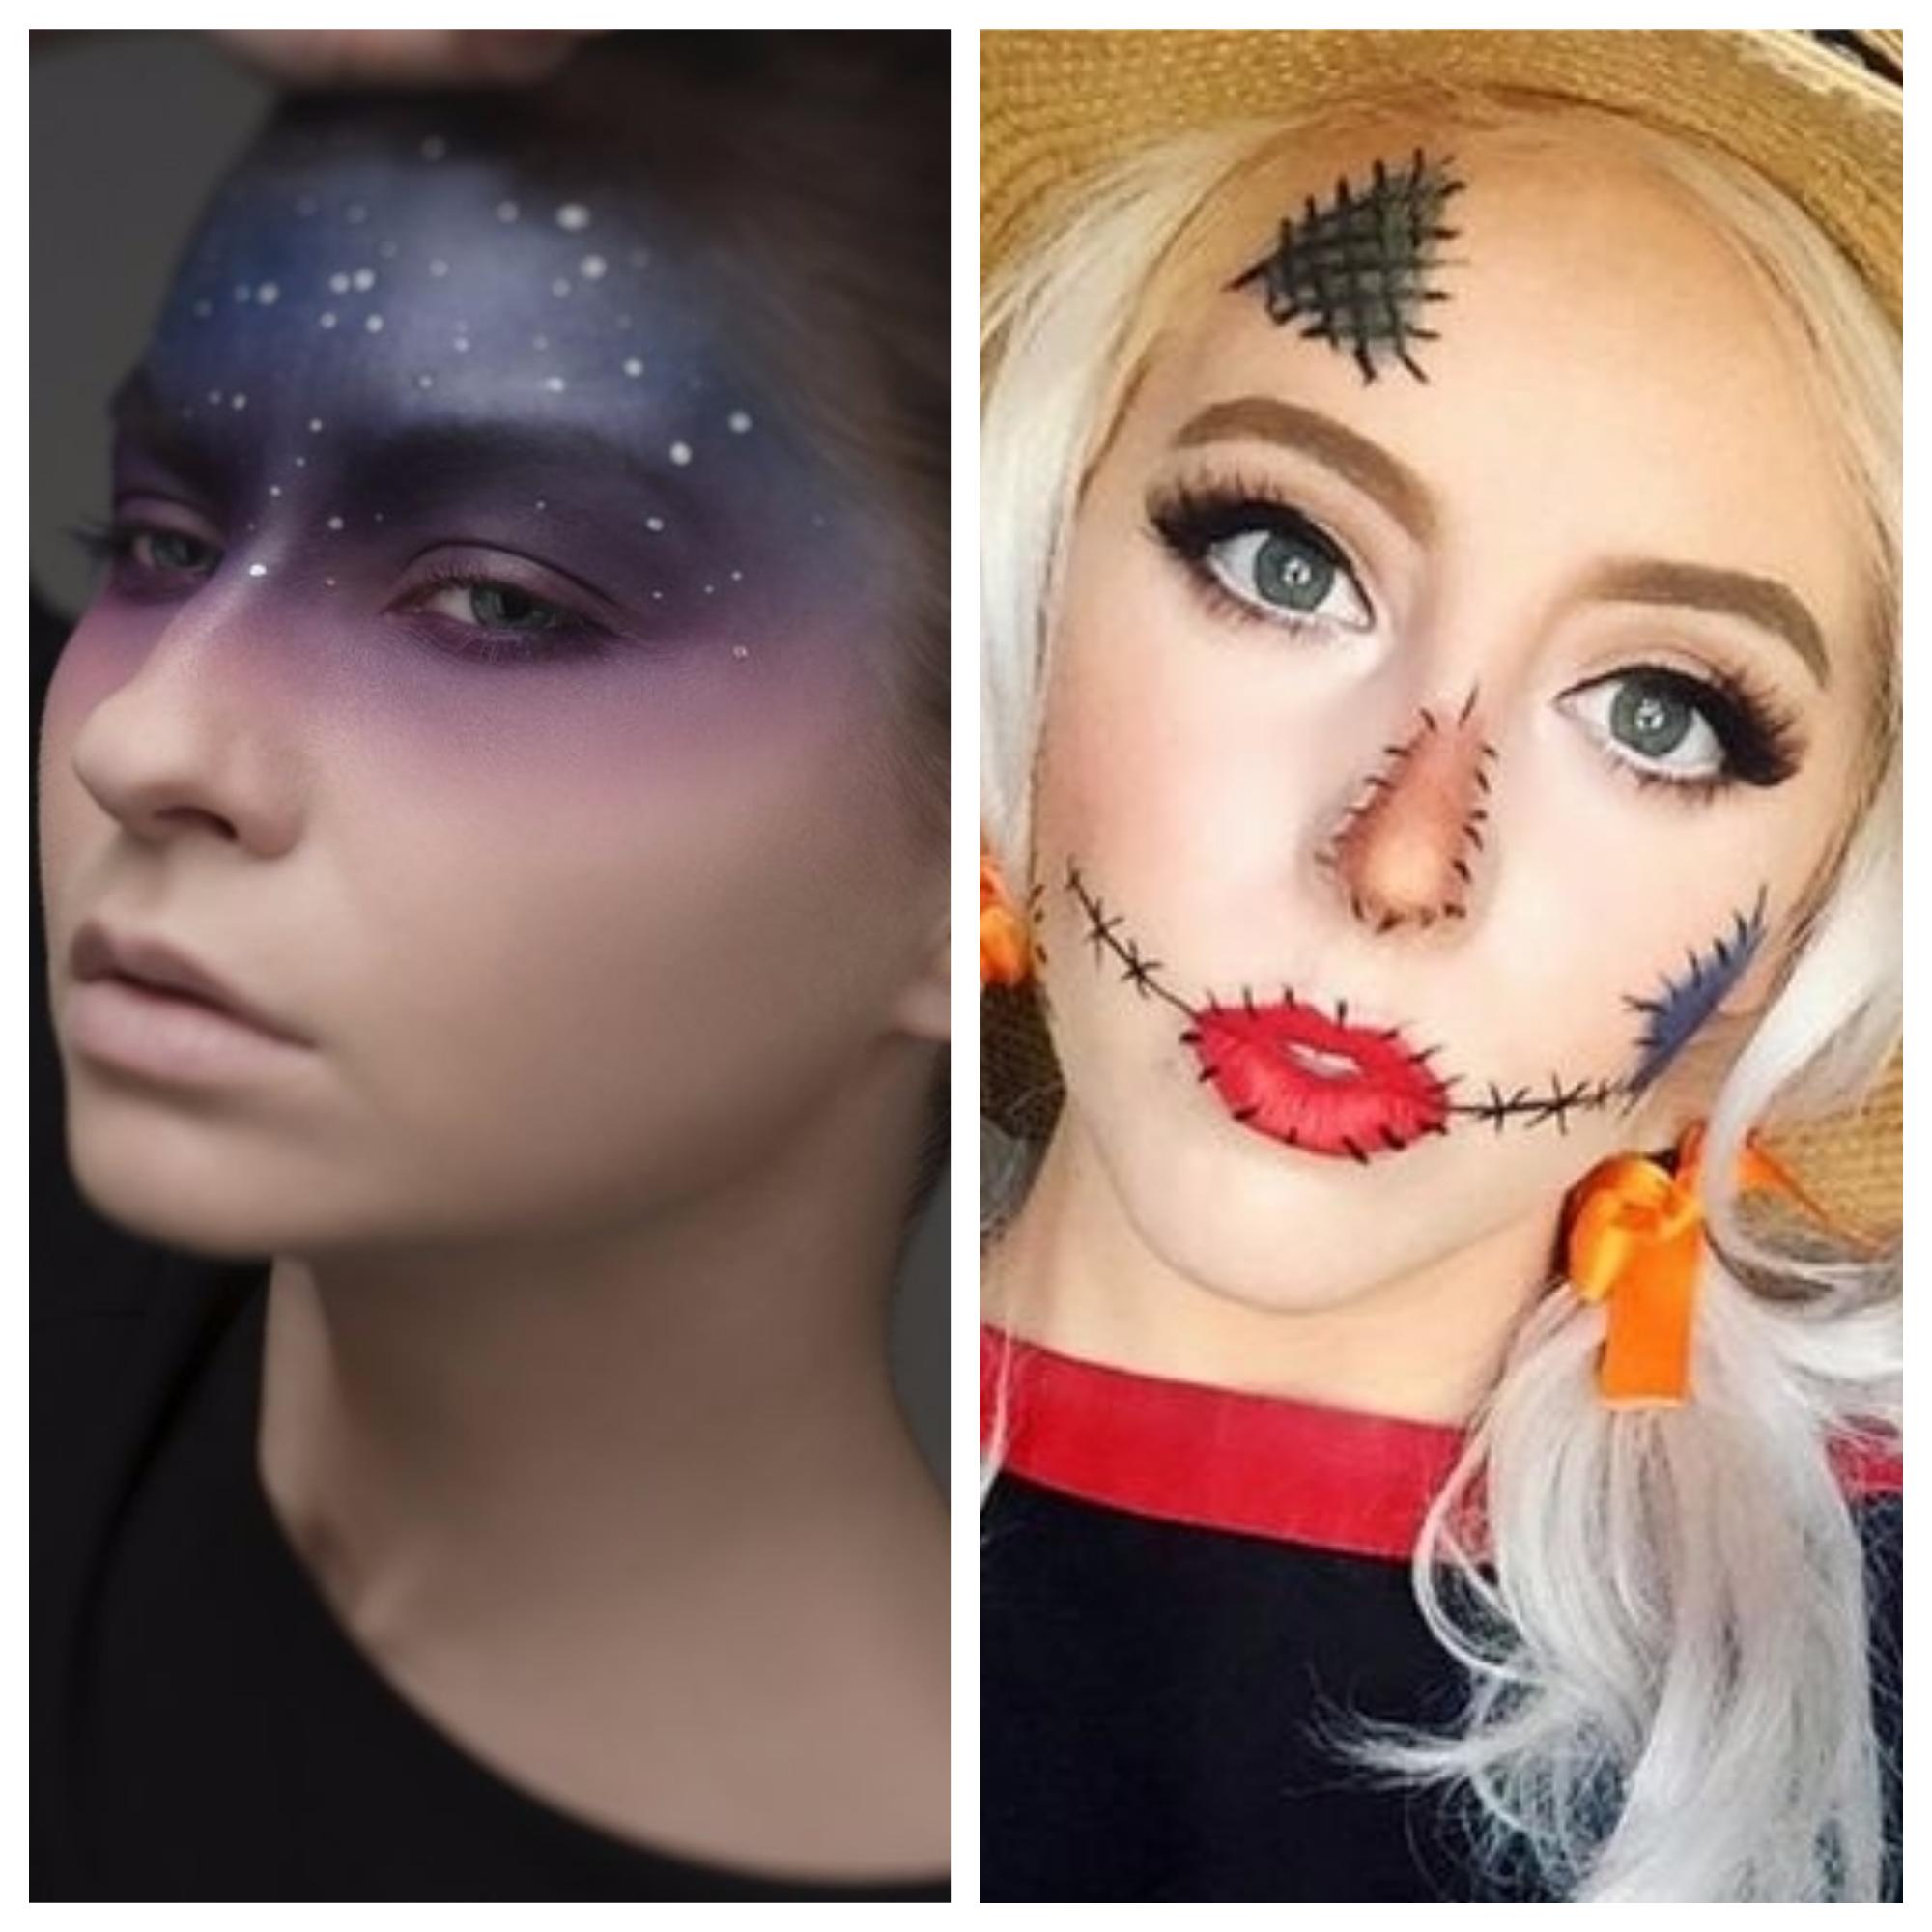 espantalho maquiagens halloween